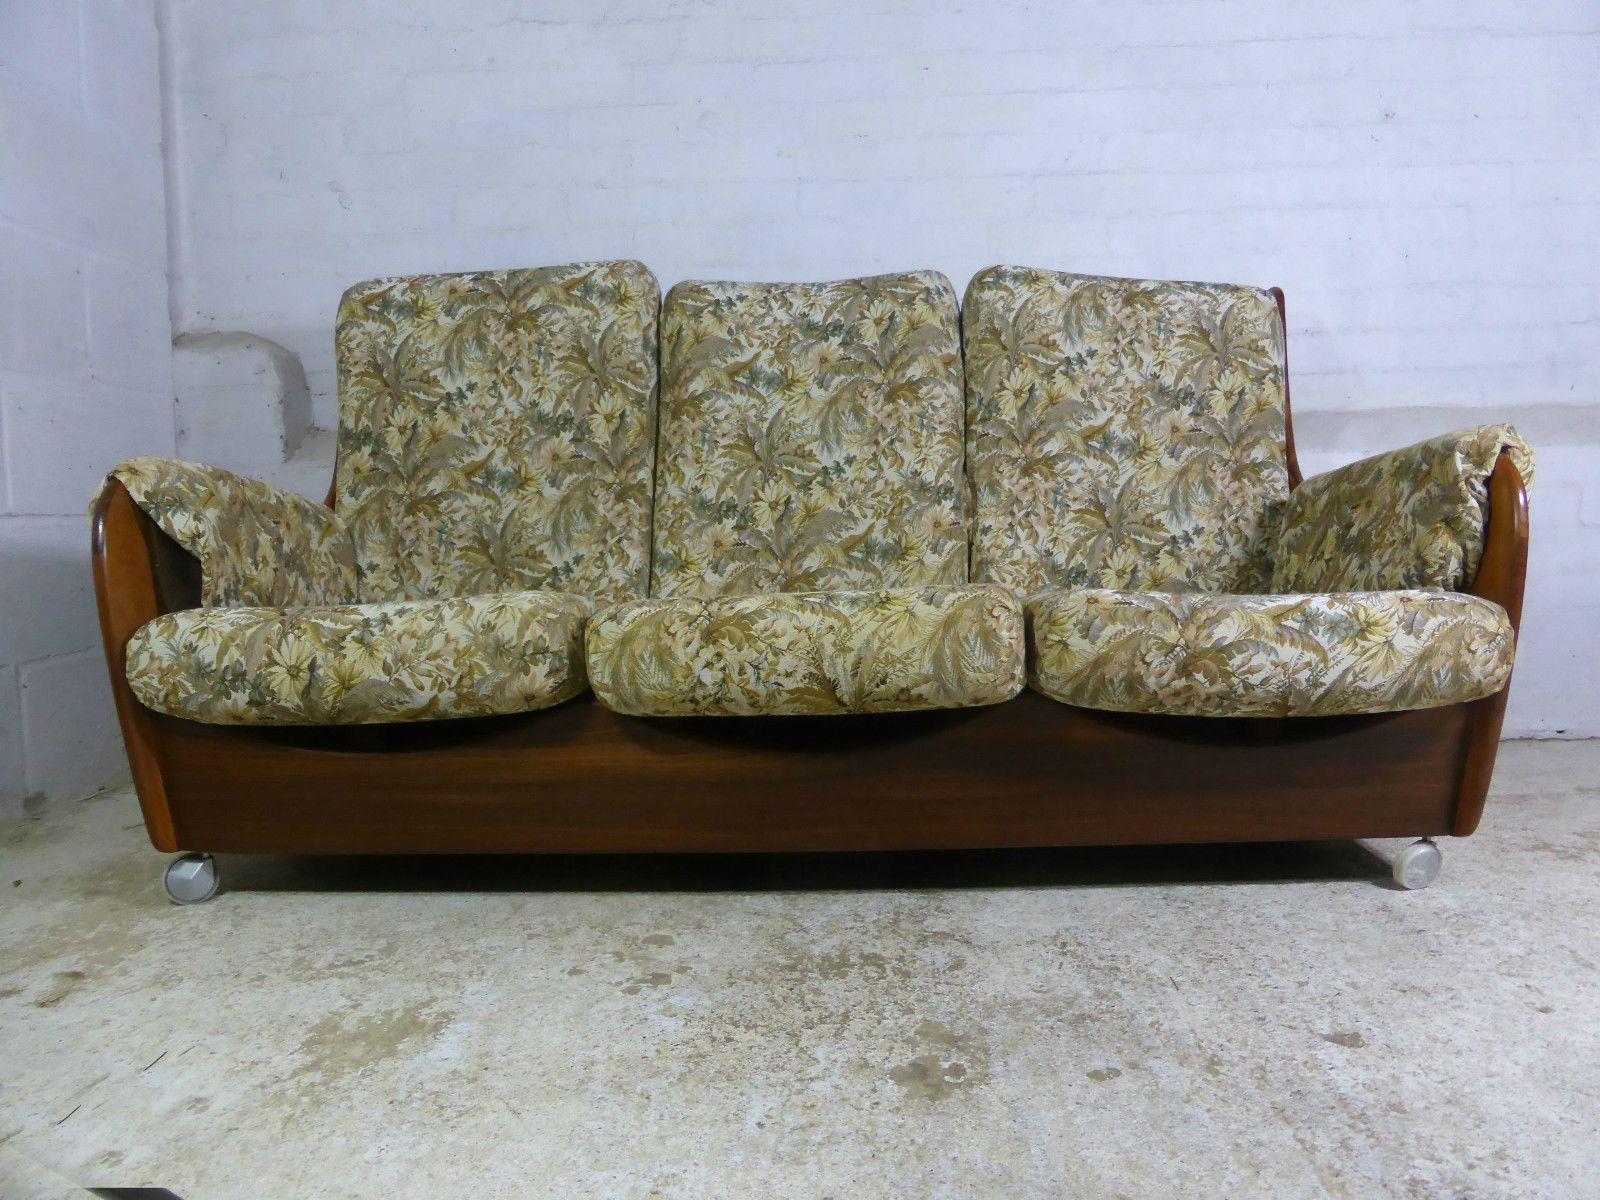 Http Www Ebay Co Uk Itm Eb093 Vintage G Plan Saddle Three Seater Rh Pinterest Com Leather Sofa